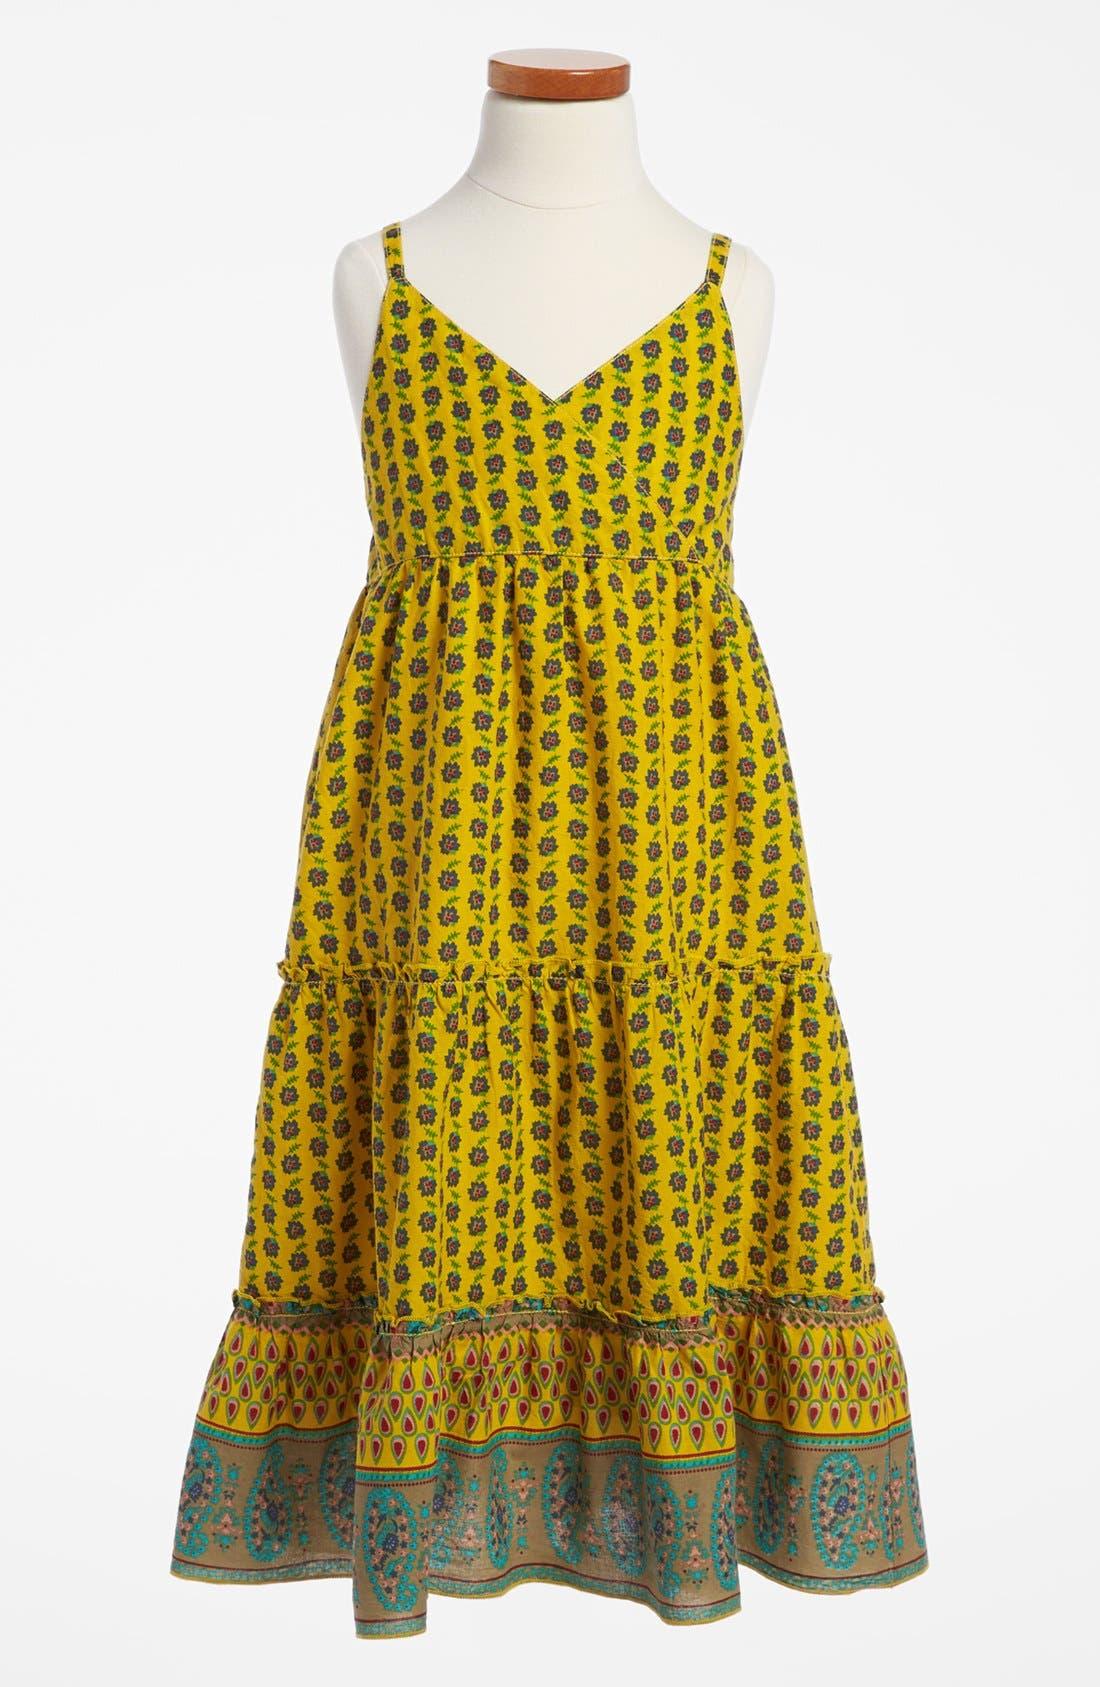 Alternate Image 1 Selected - Peek 'Alyssa' Sleeveless Dress (Toddler Girls, Little Girls & Big Girls)